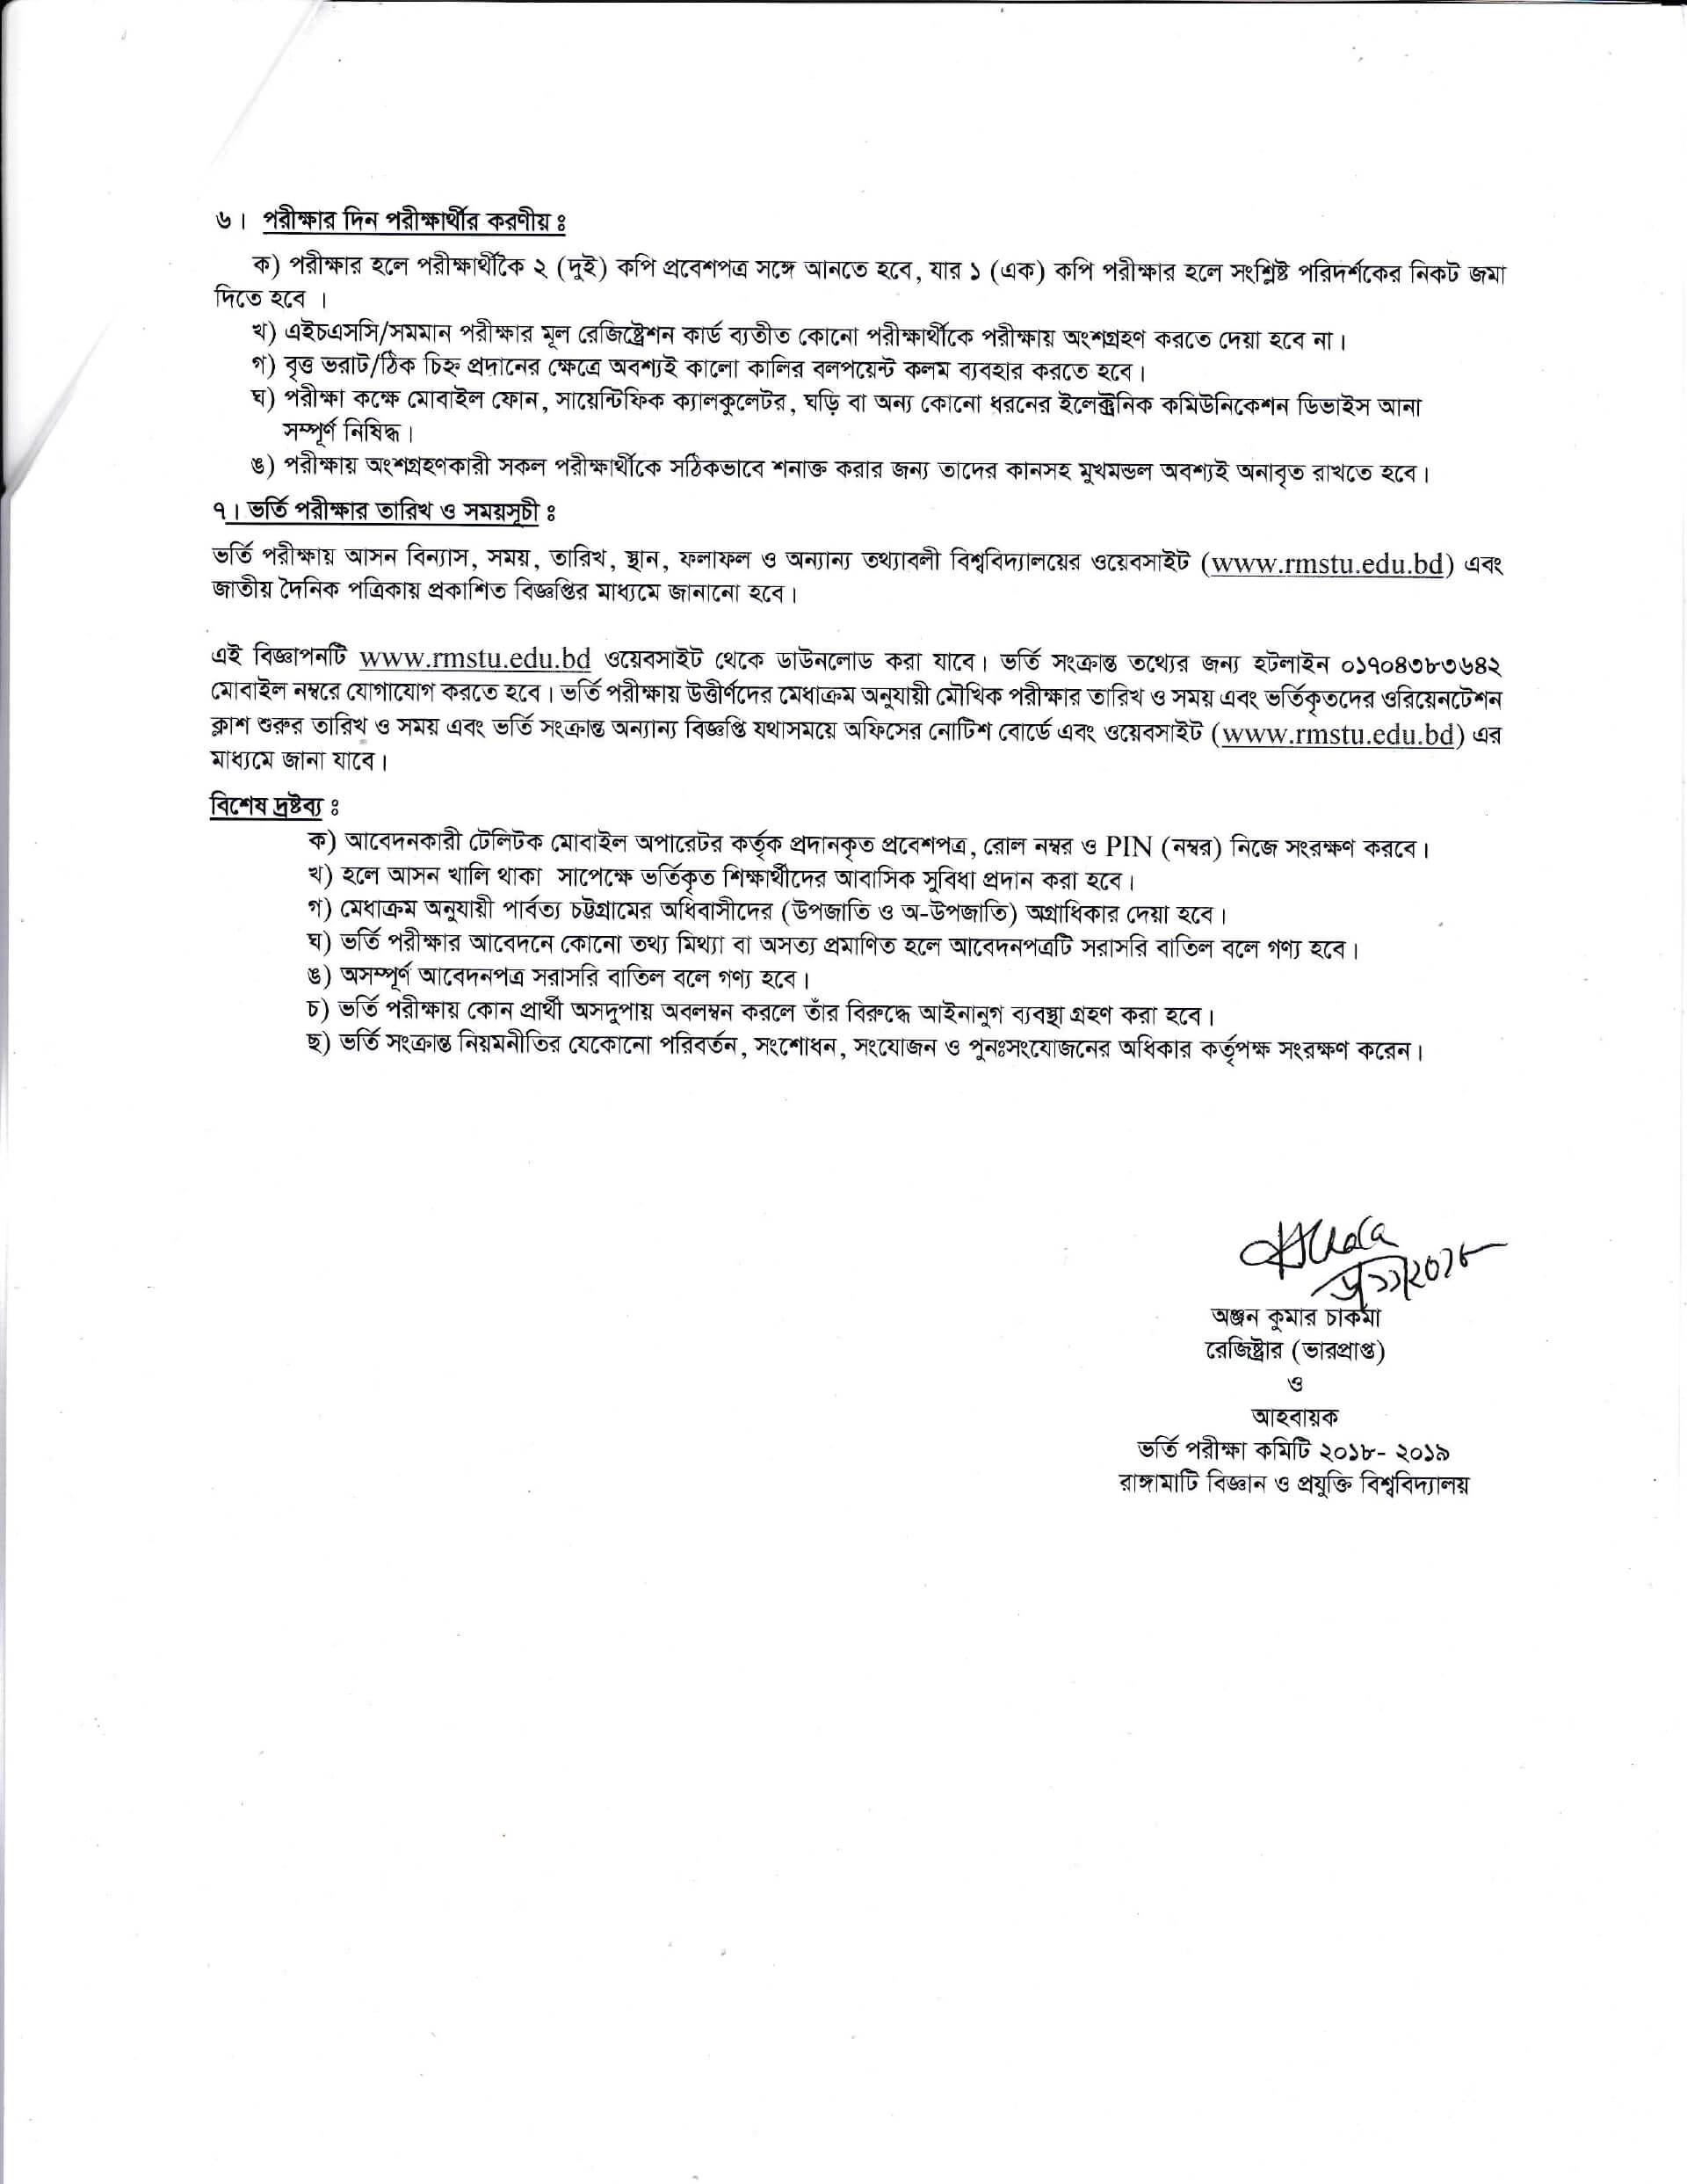 Rangamati Science and Technology University Admission Circular-3